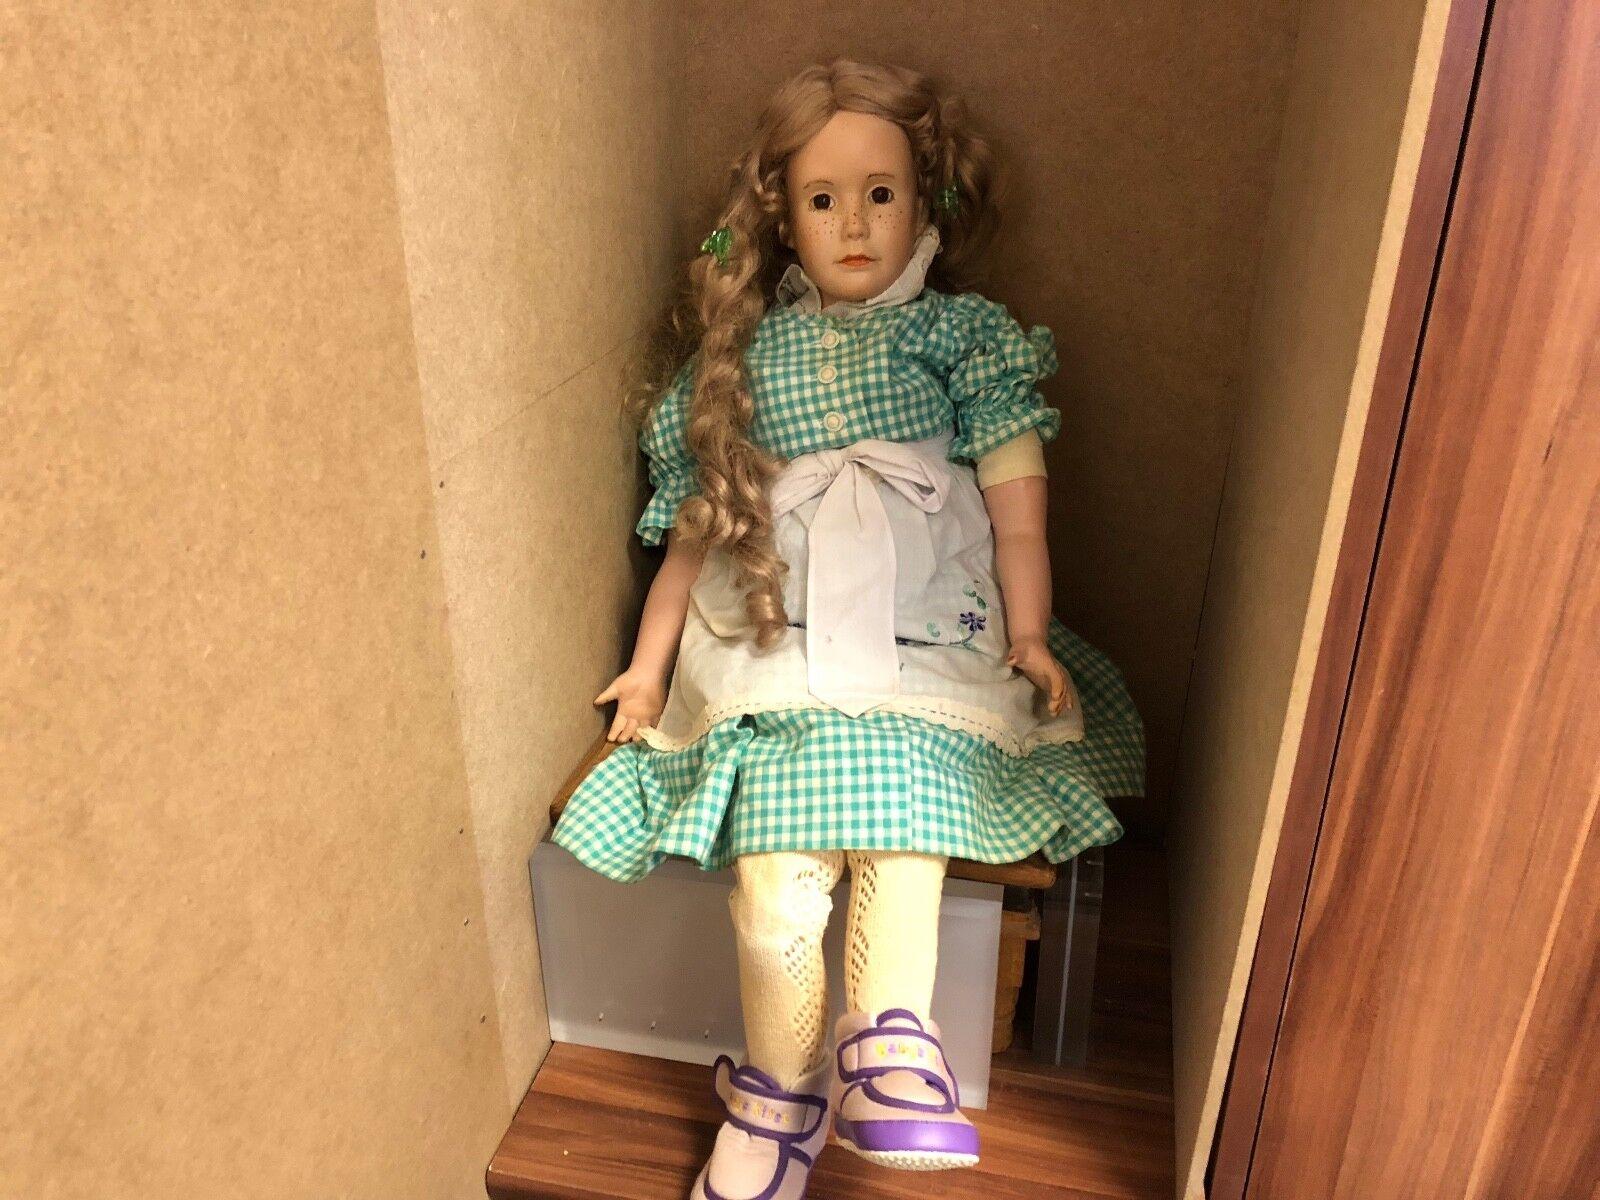 Künstlerpuppe Porzellan Doll 81 cm. Top Zustand